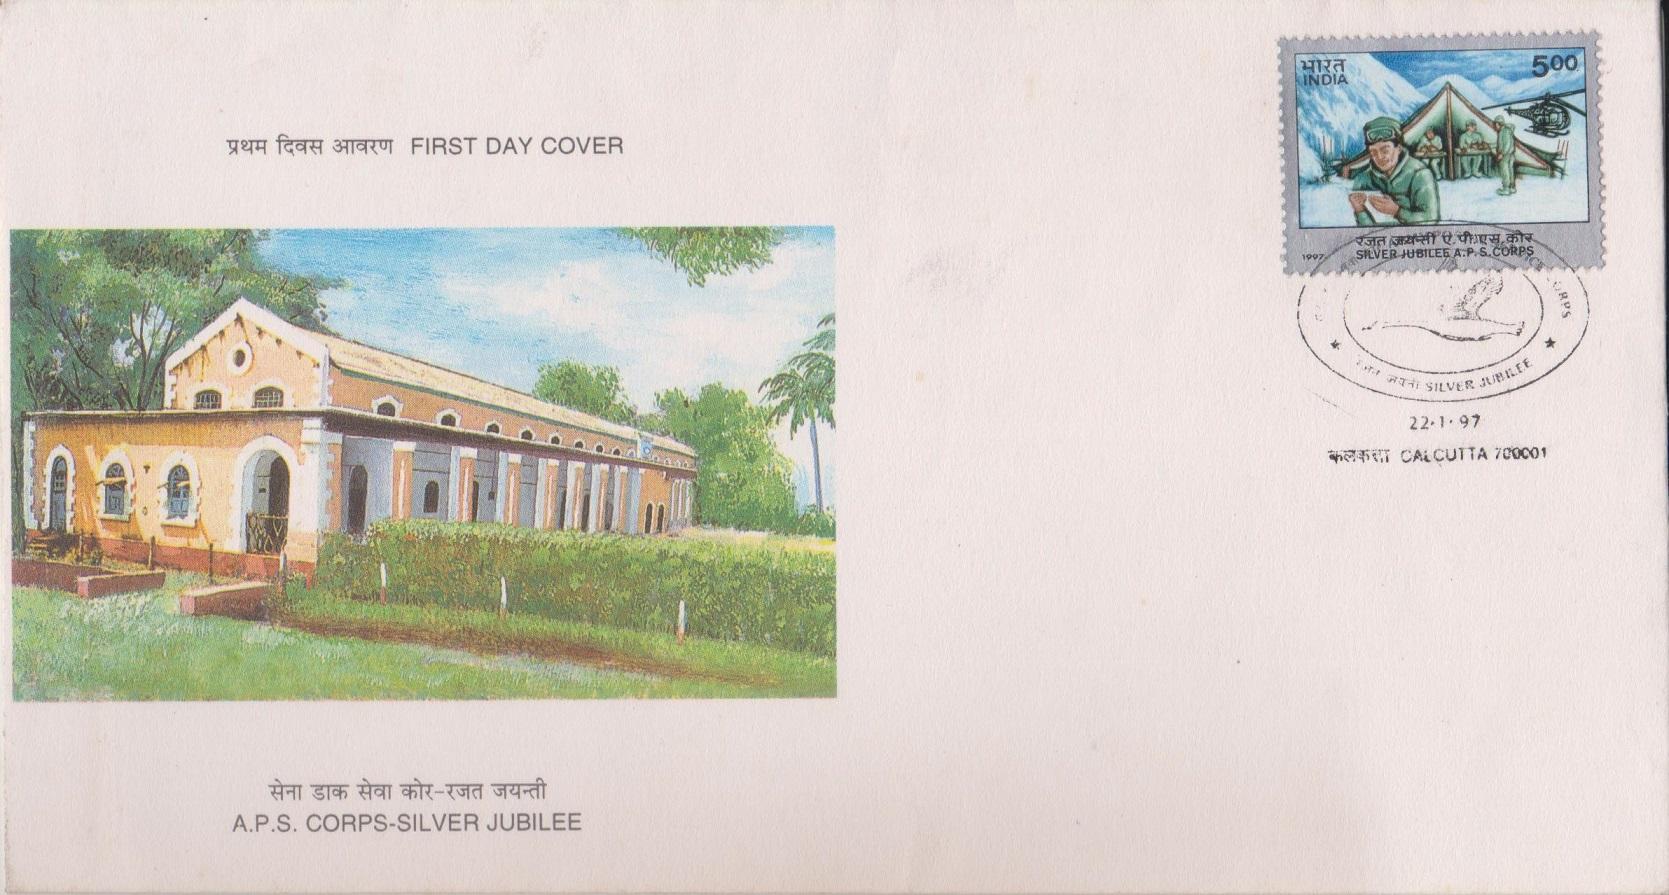 Sena Dak Bhawan (सेना डाक भवन)